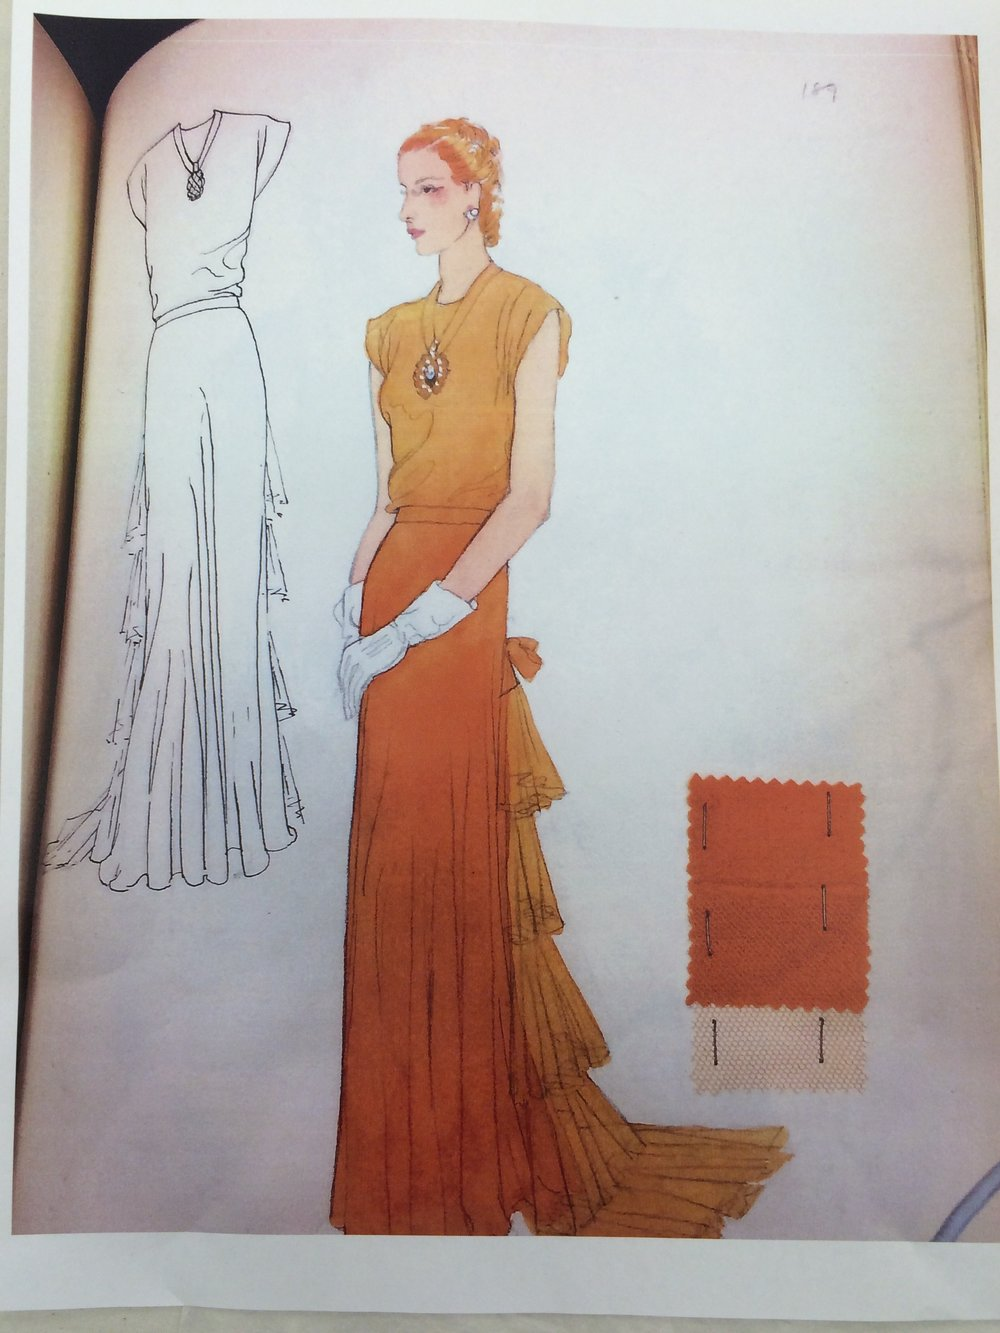 Dress Design, Fall 1946